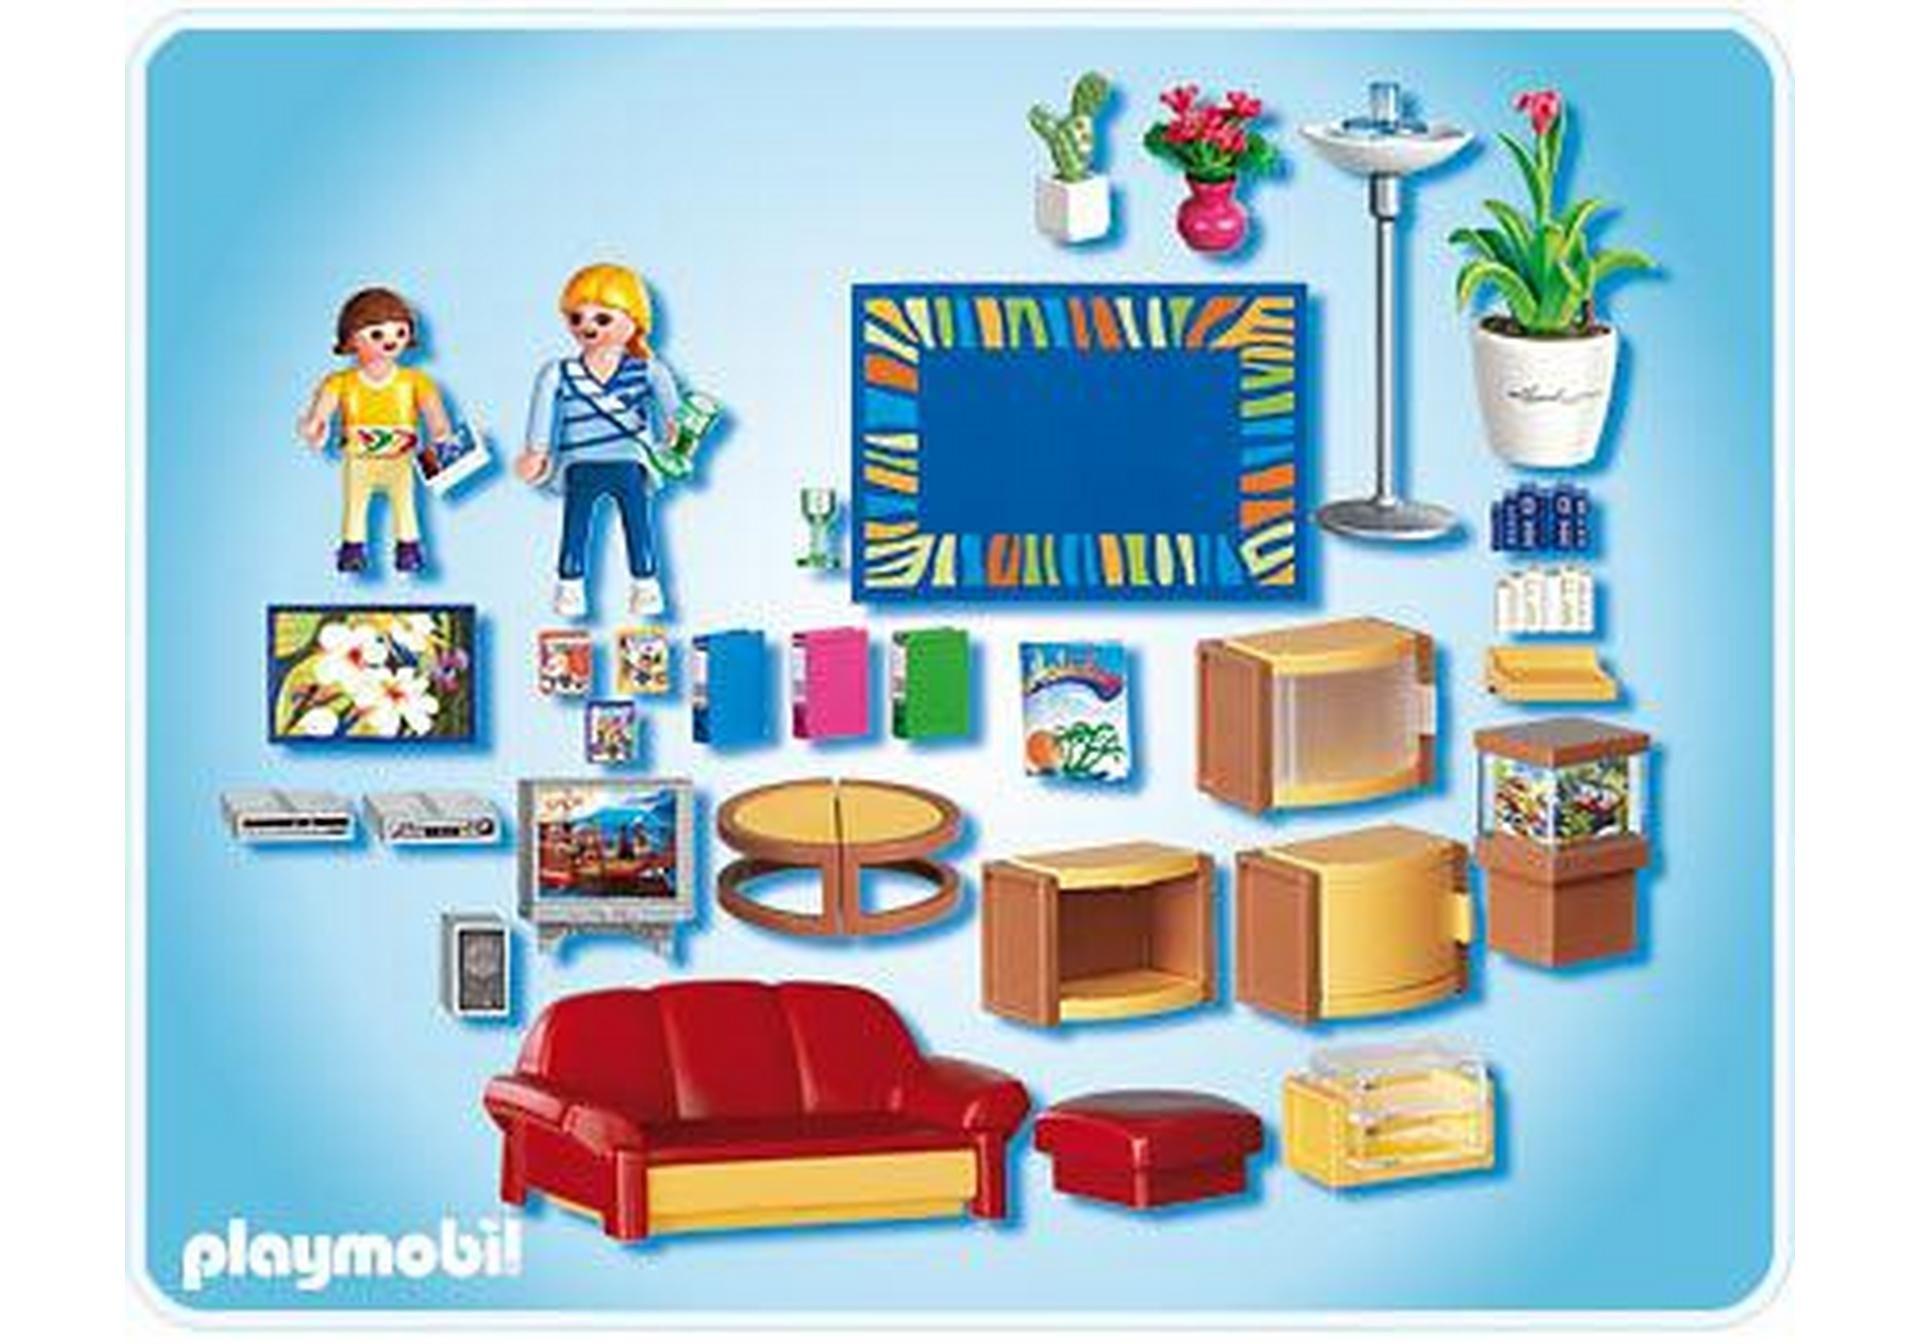 Playmobil Wohnzimmer | Pin By Brock Neal On Brooklyn S Board Pinterest Playmobil